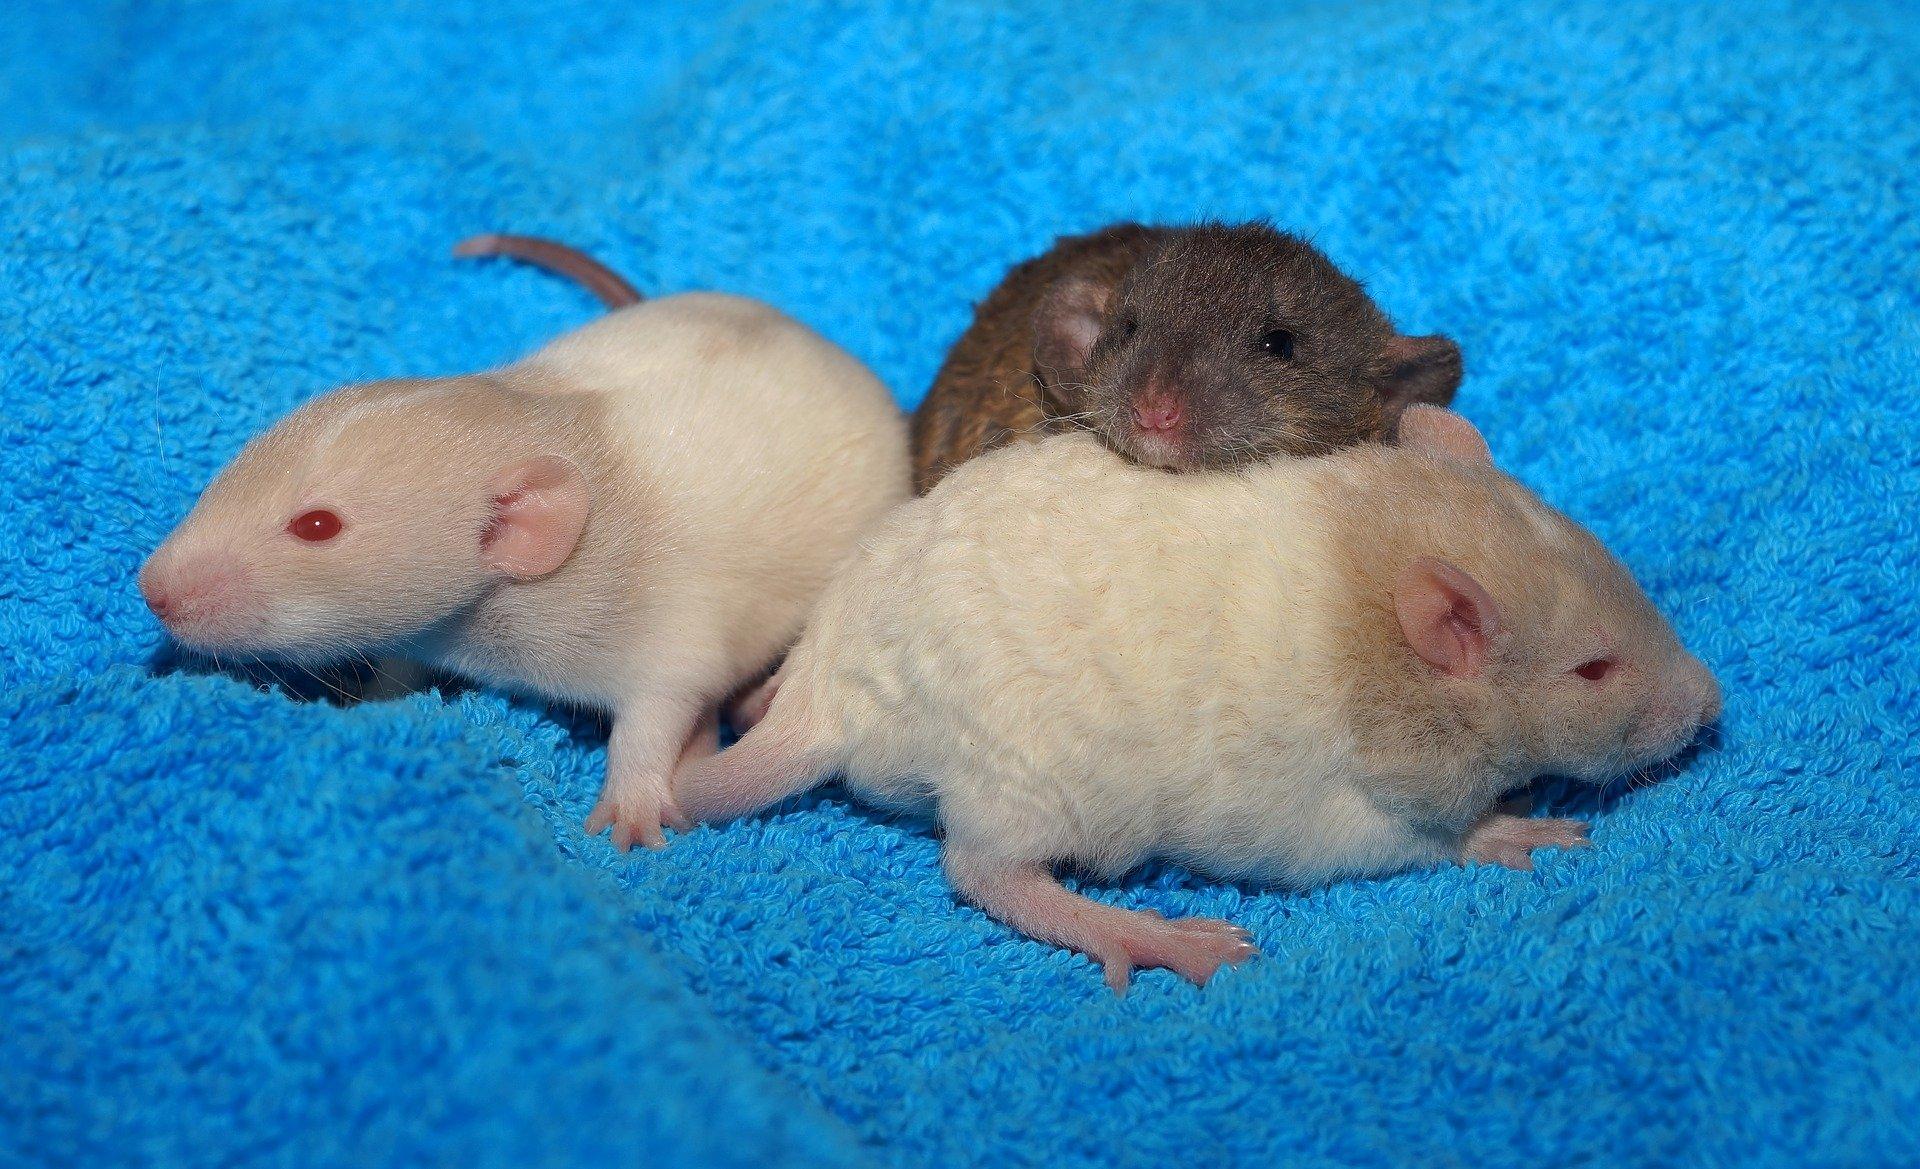 Cute Rat Wallpaper Hd 1366x768 Cute Baby Rats Full Hd Wallpaper And Background Image